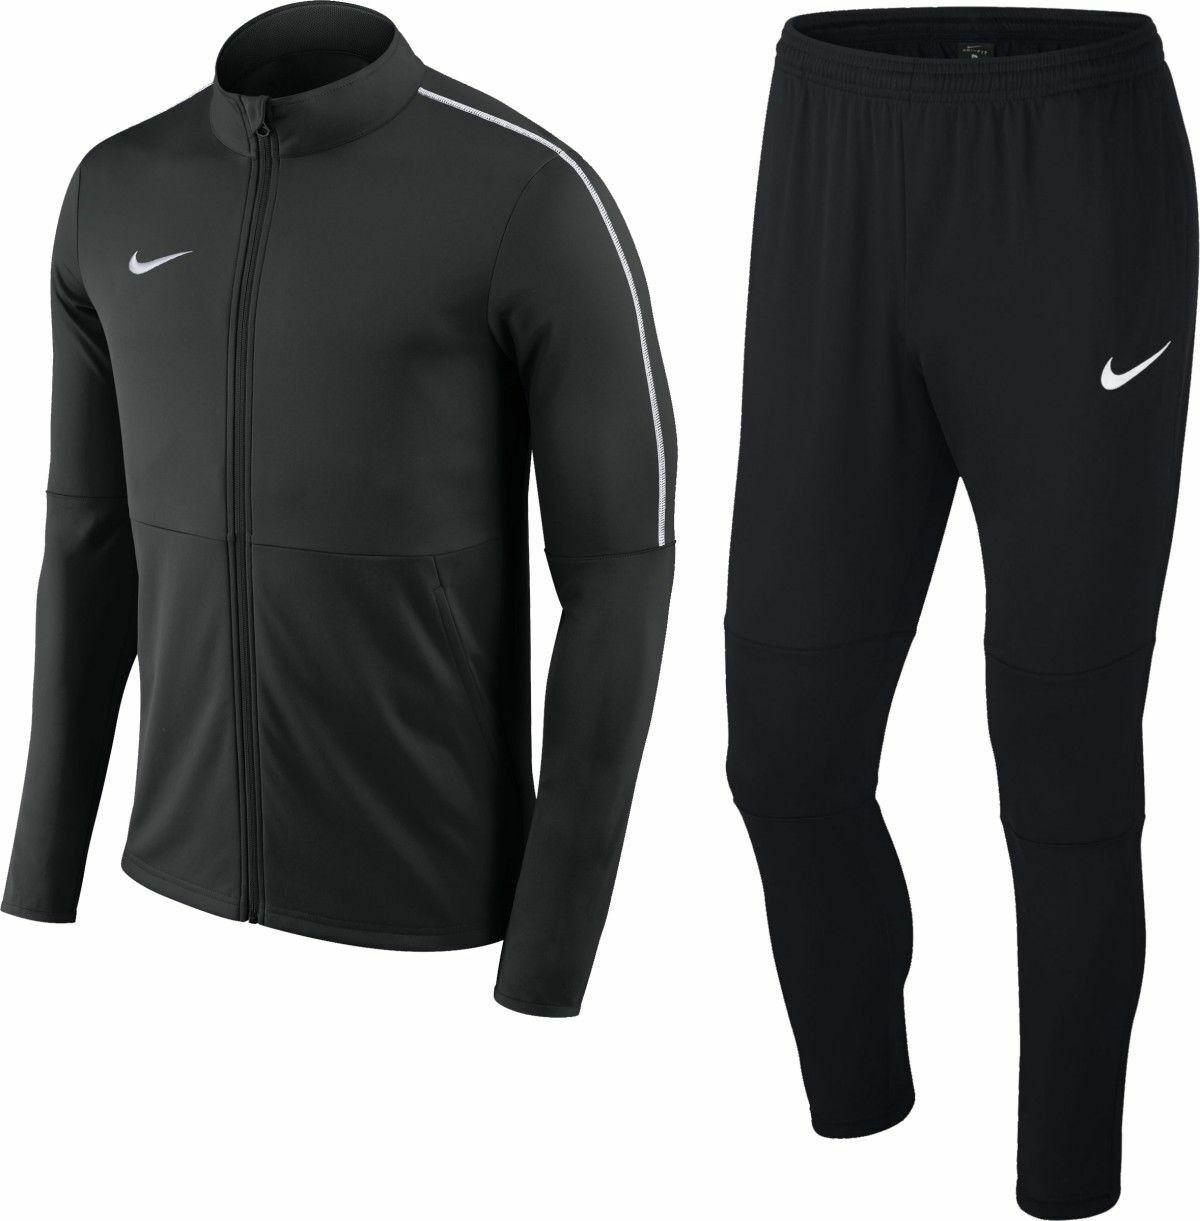 Nike Park 18 AA2059 AA2086 Tuta Ginnastica Completo Giacca Pantalone Da Uomo